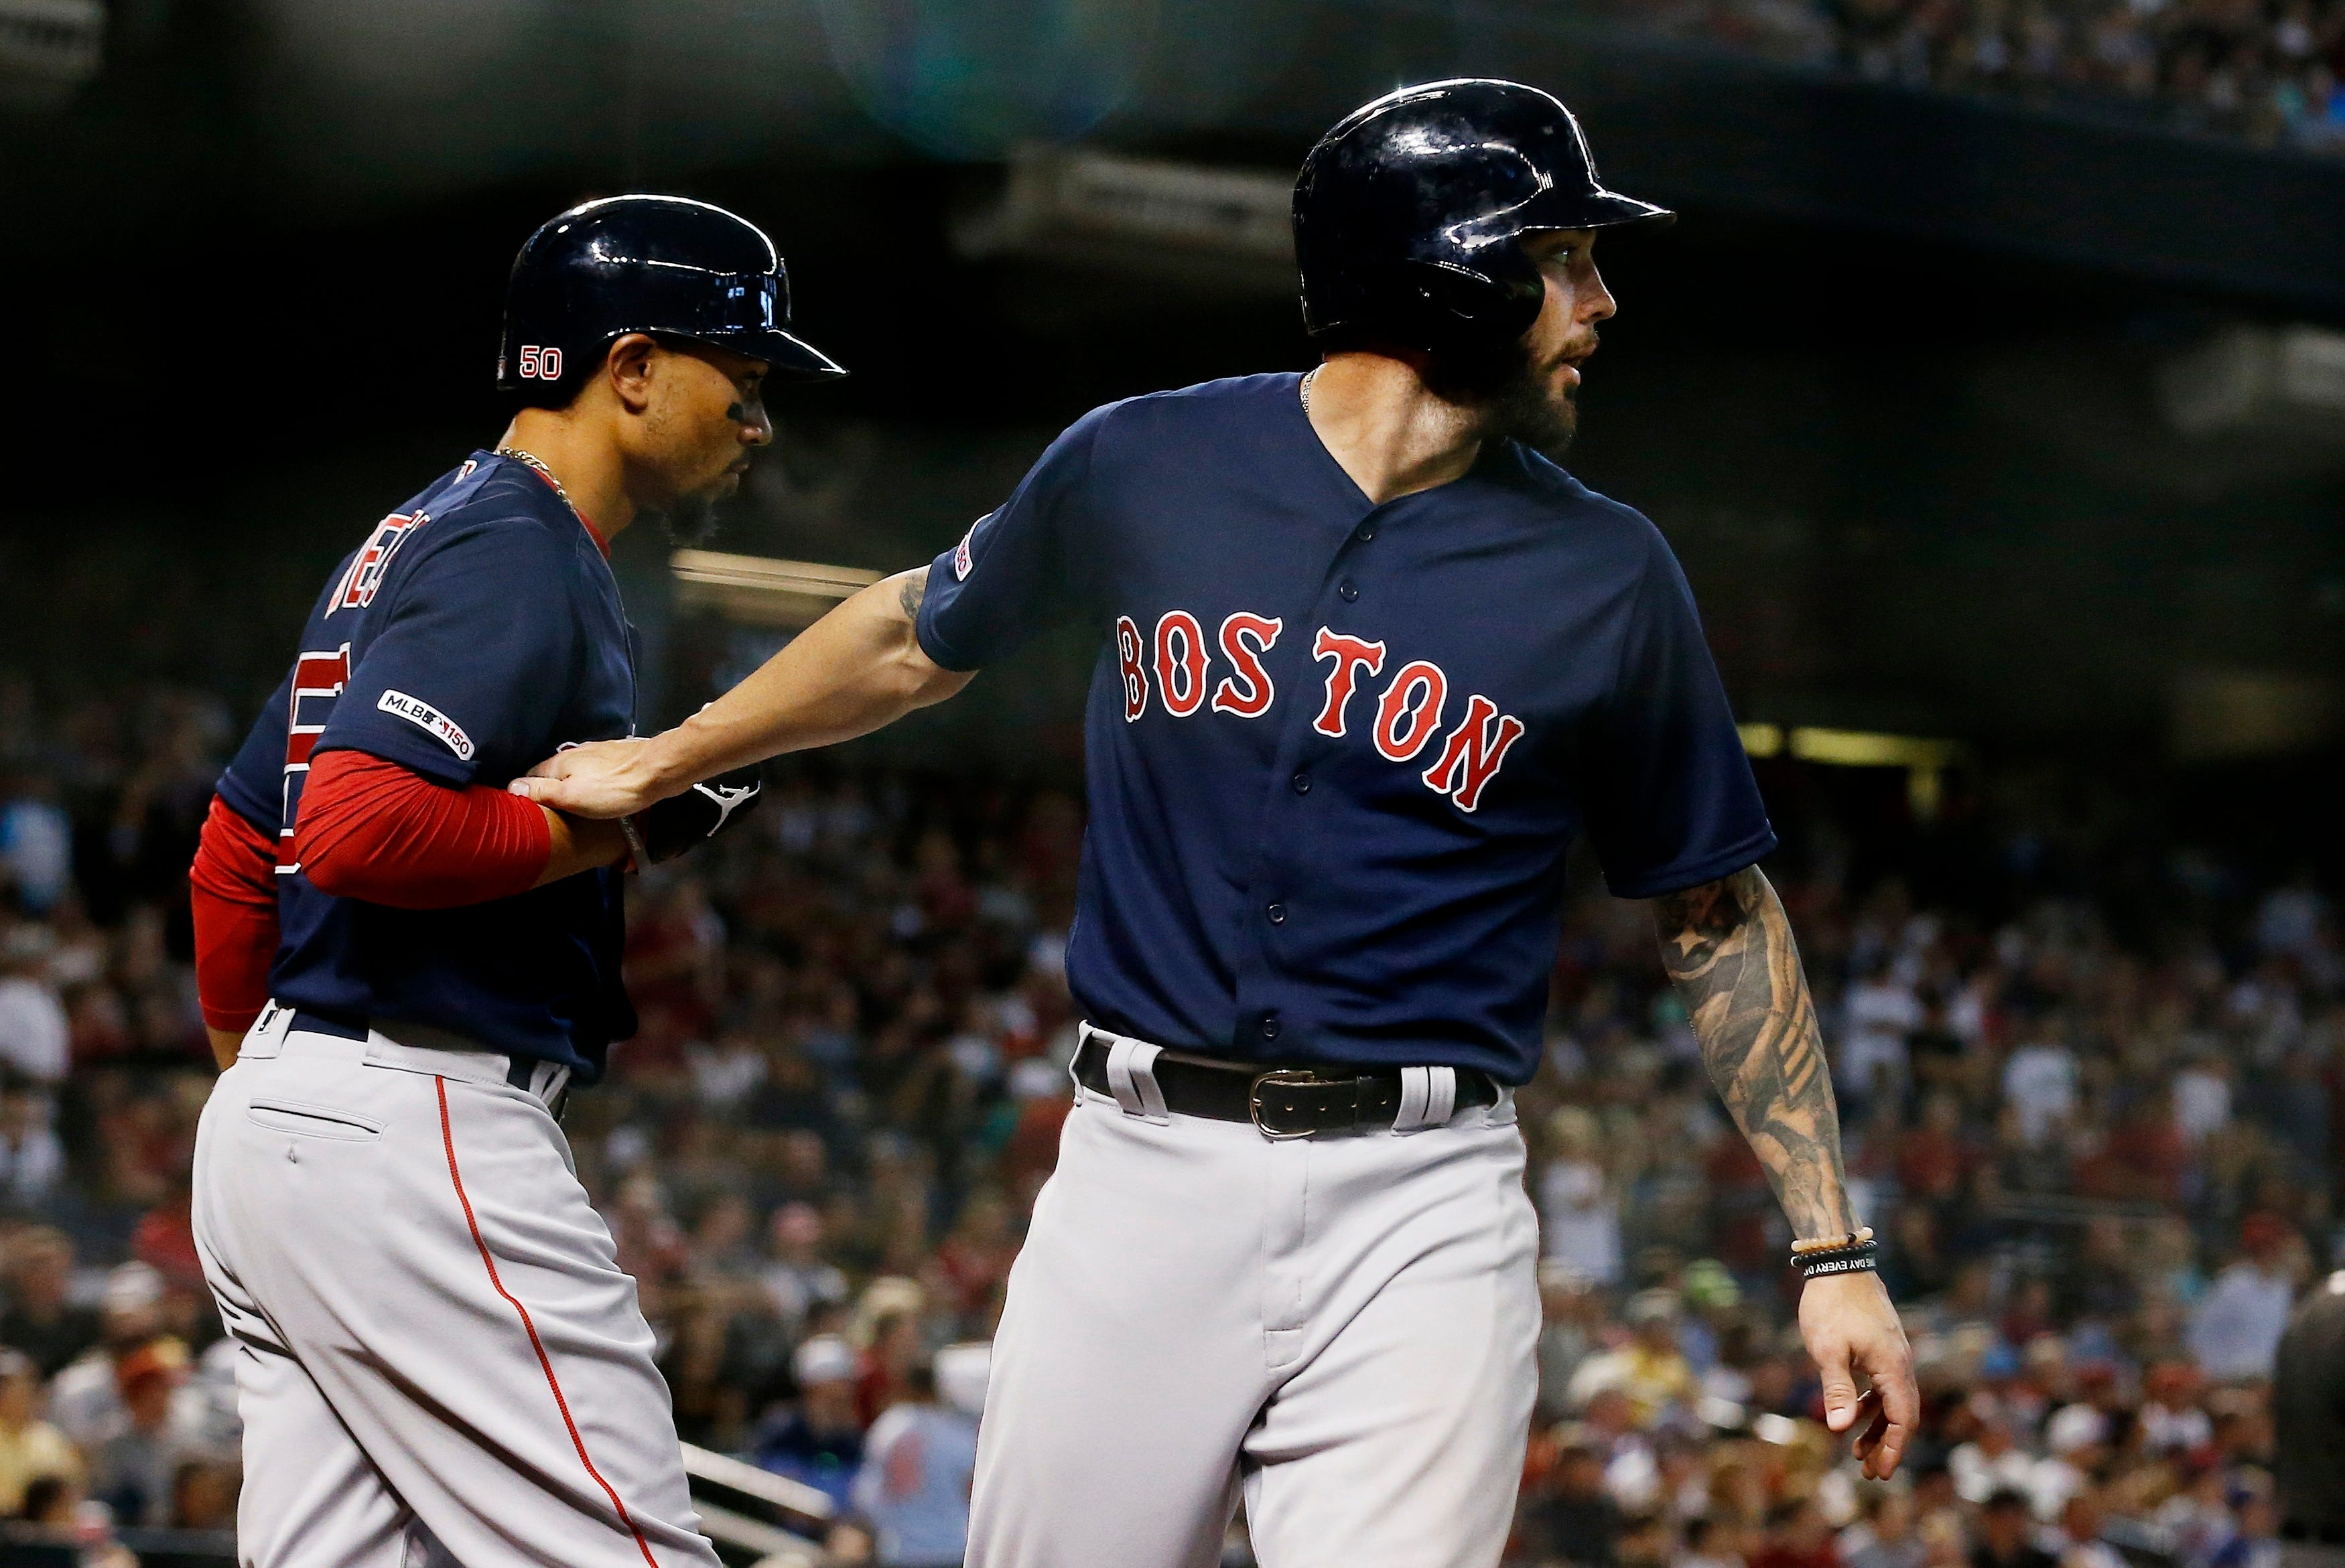 Red Sox trade Swihart to Arizona for minor leaguer